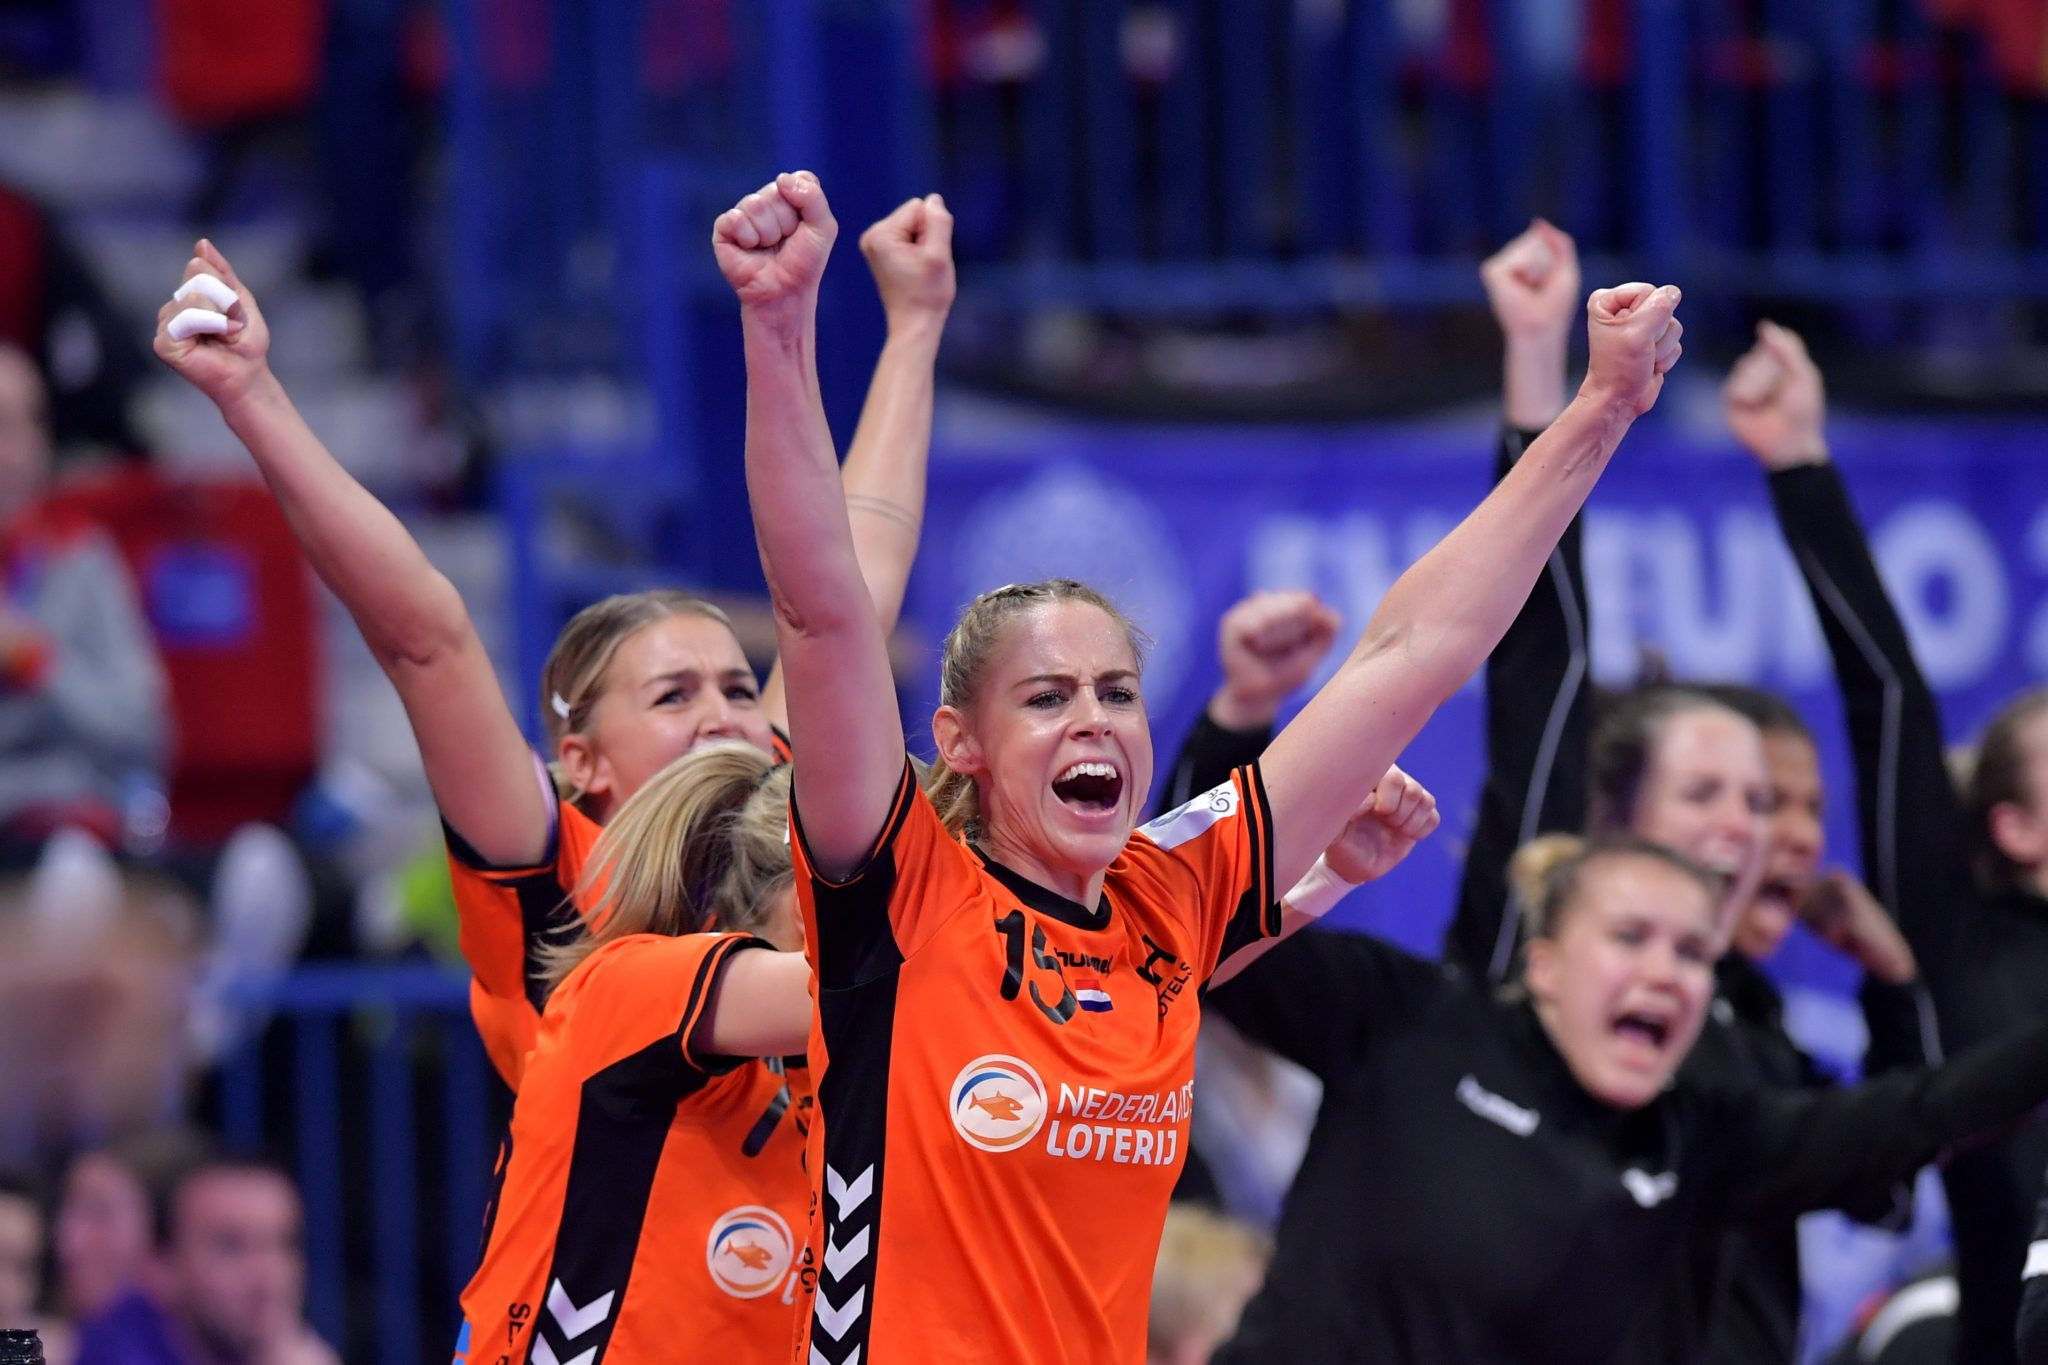 09-12-2018: Handbal: Vrouwen Nederland V Roemenie: Nancy EK Handbal In Frankrijk, Hoofdronde Groep II Nederland - Roemenie Maura Visser #15  NED Juicht